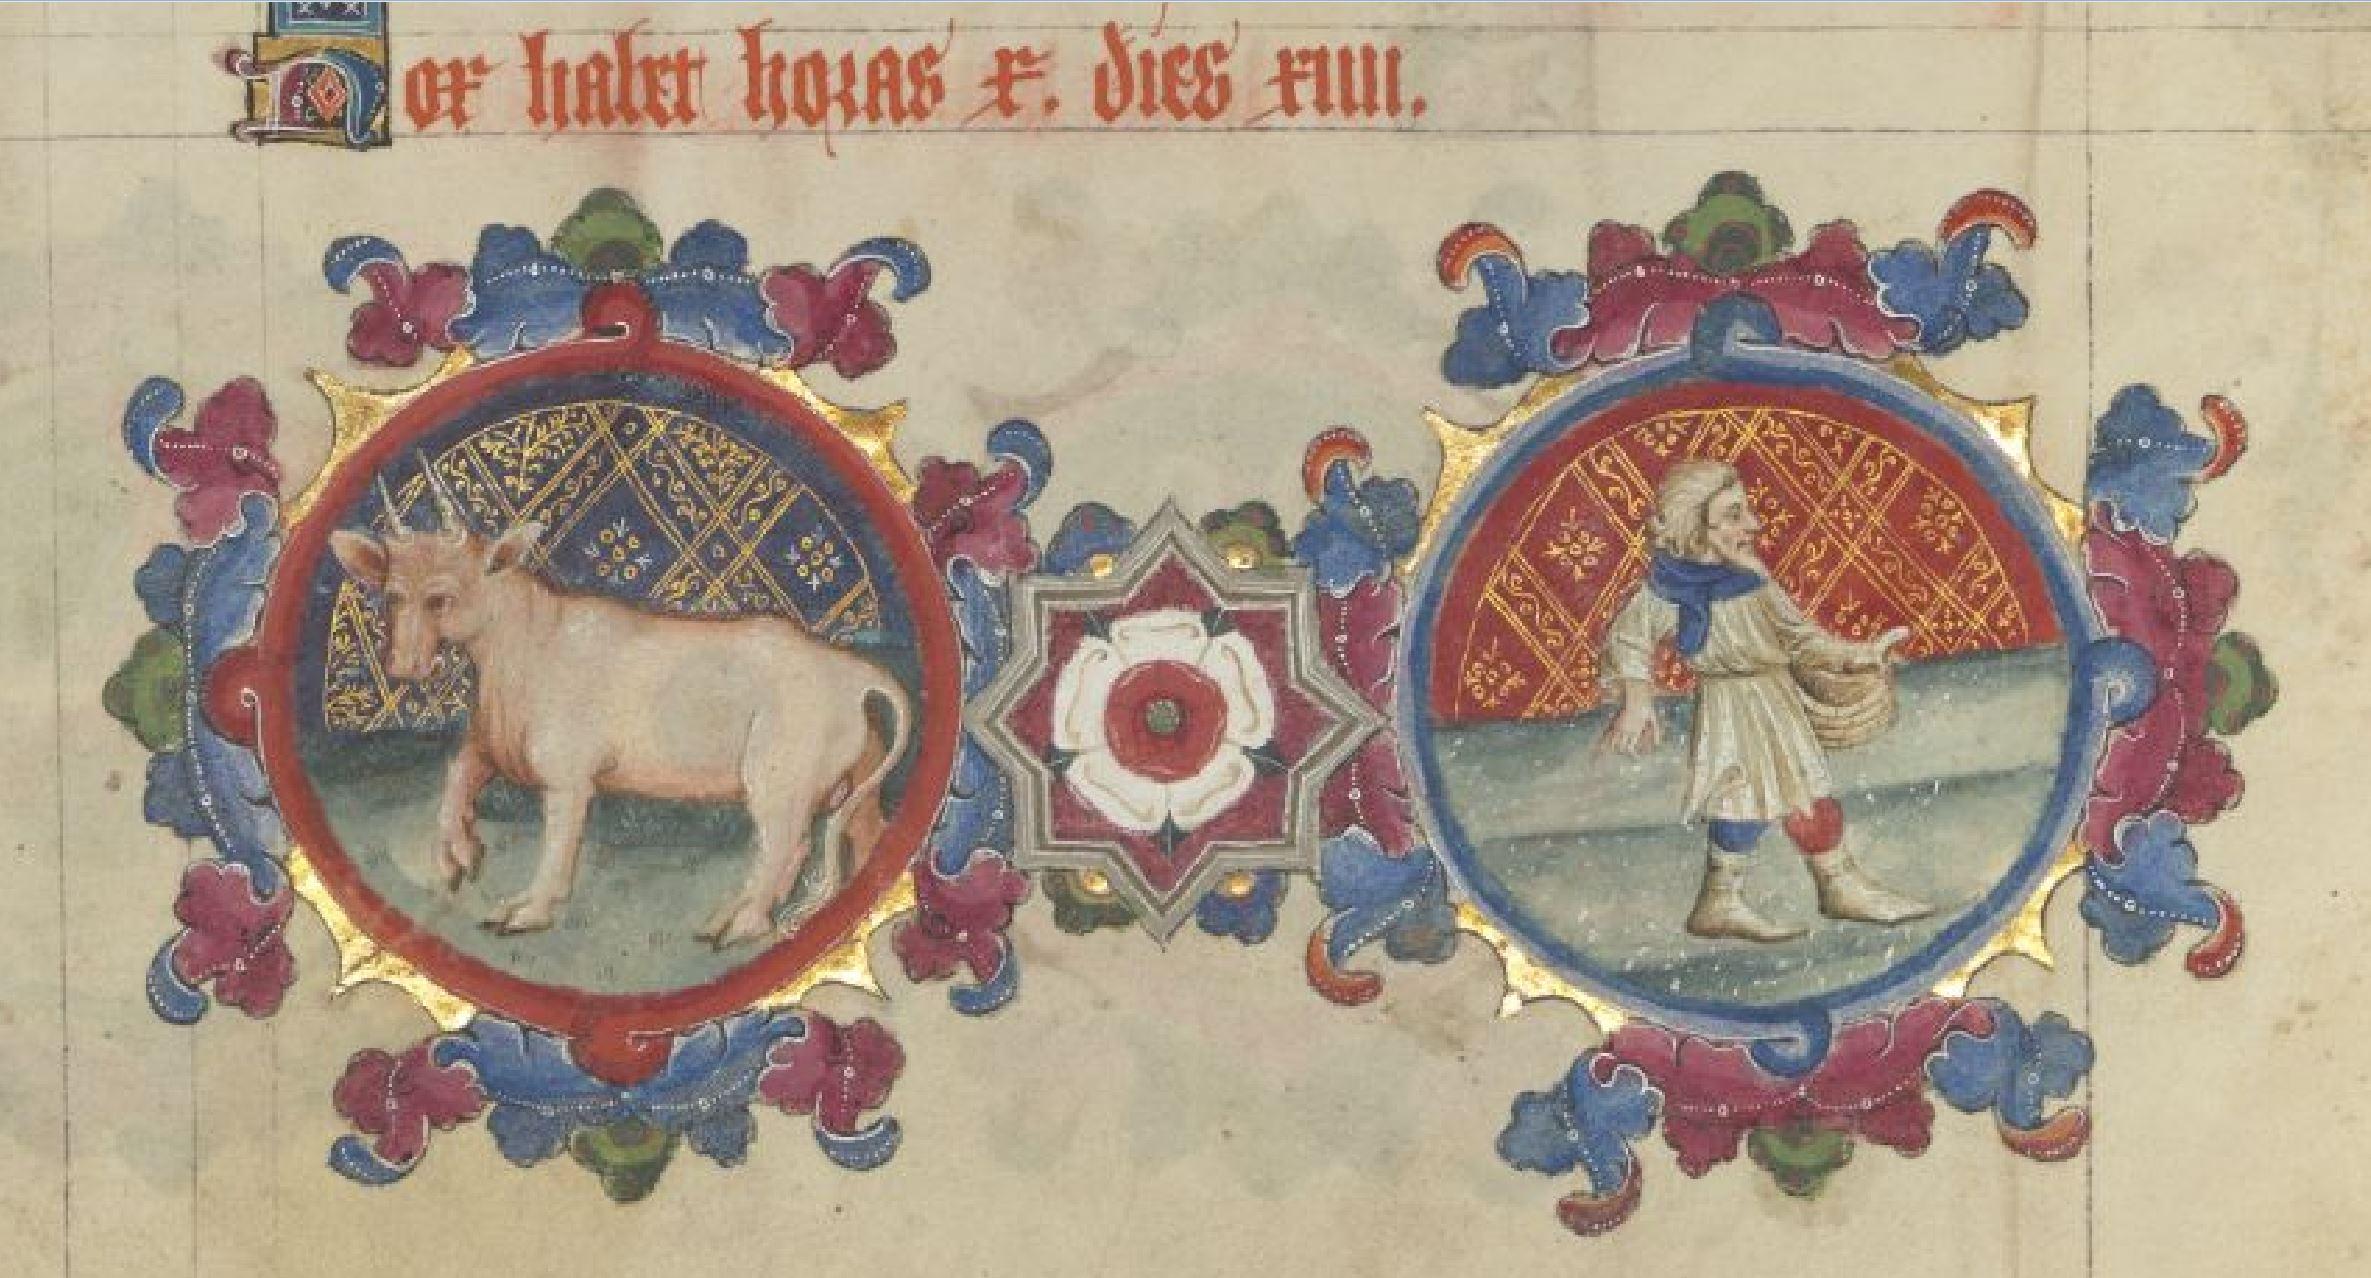 1399-1407 Sherborne Missal BL Add MS 74236 Avril p 4